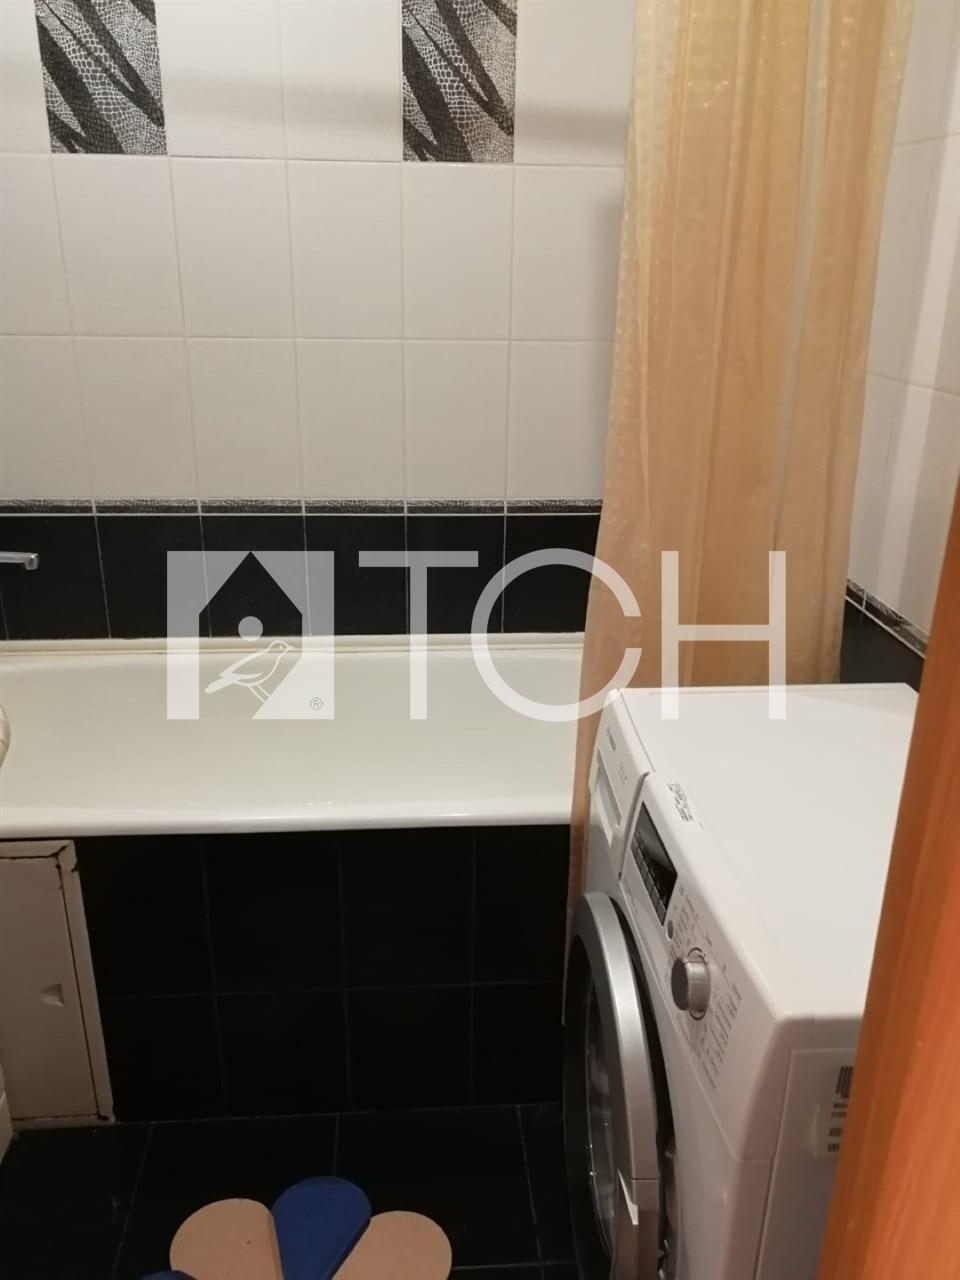 Квартира, 1 комната, 35 м² в Щелково 89261425000 купить 9